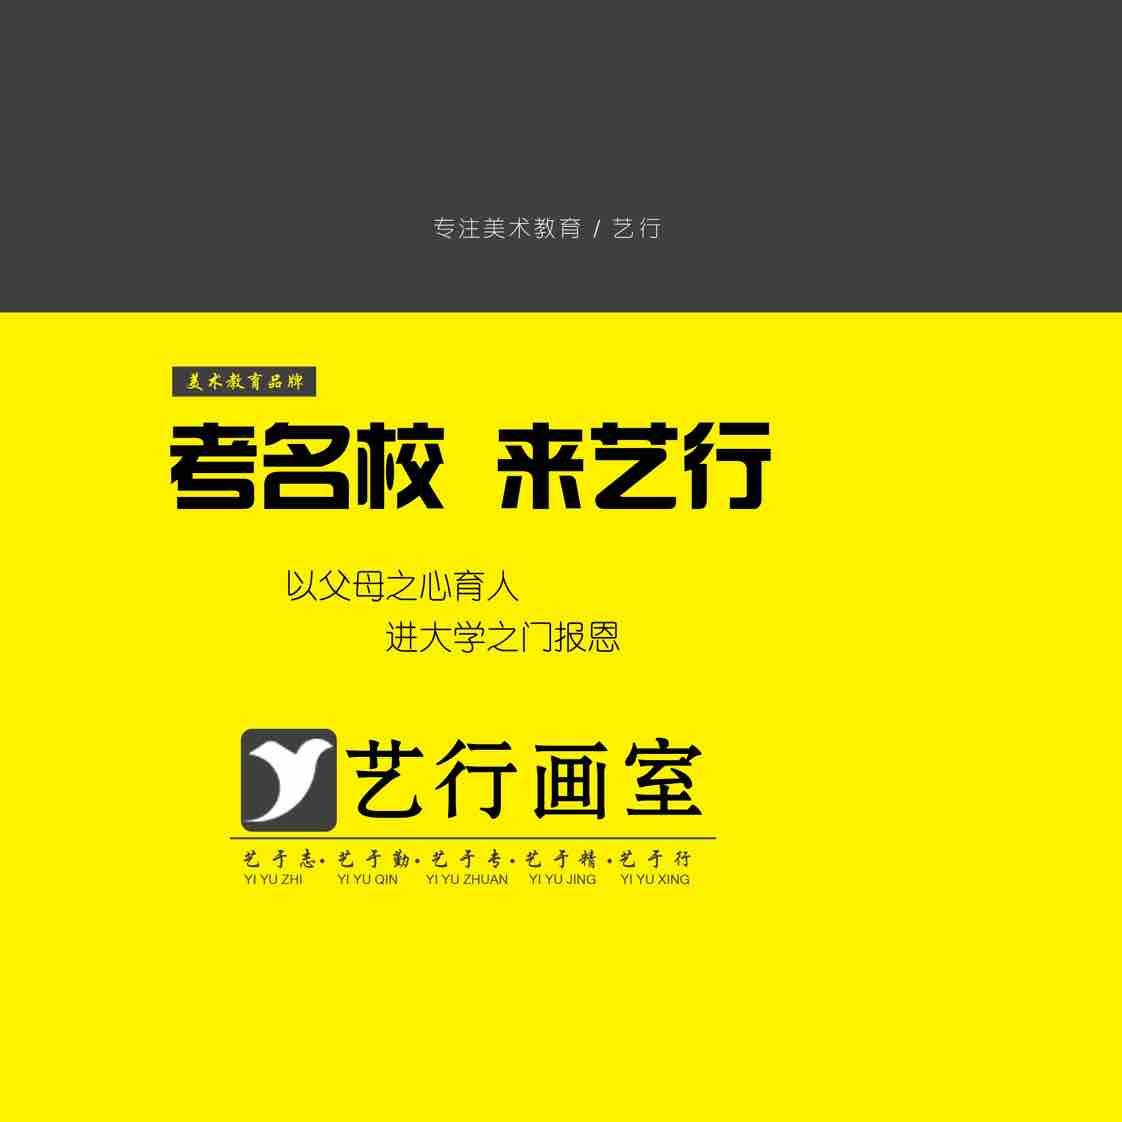 北京艺行杨老师